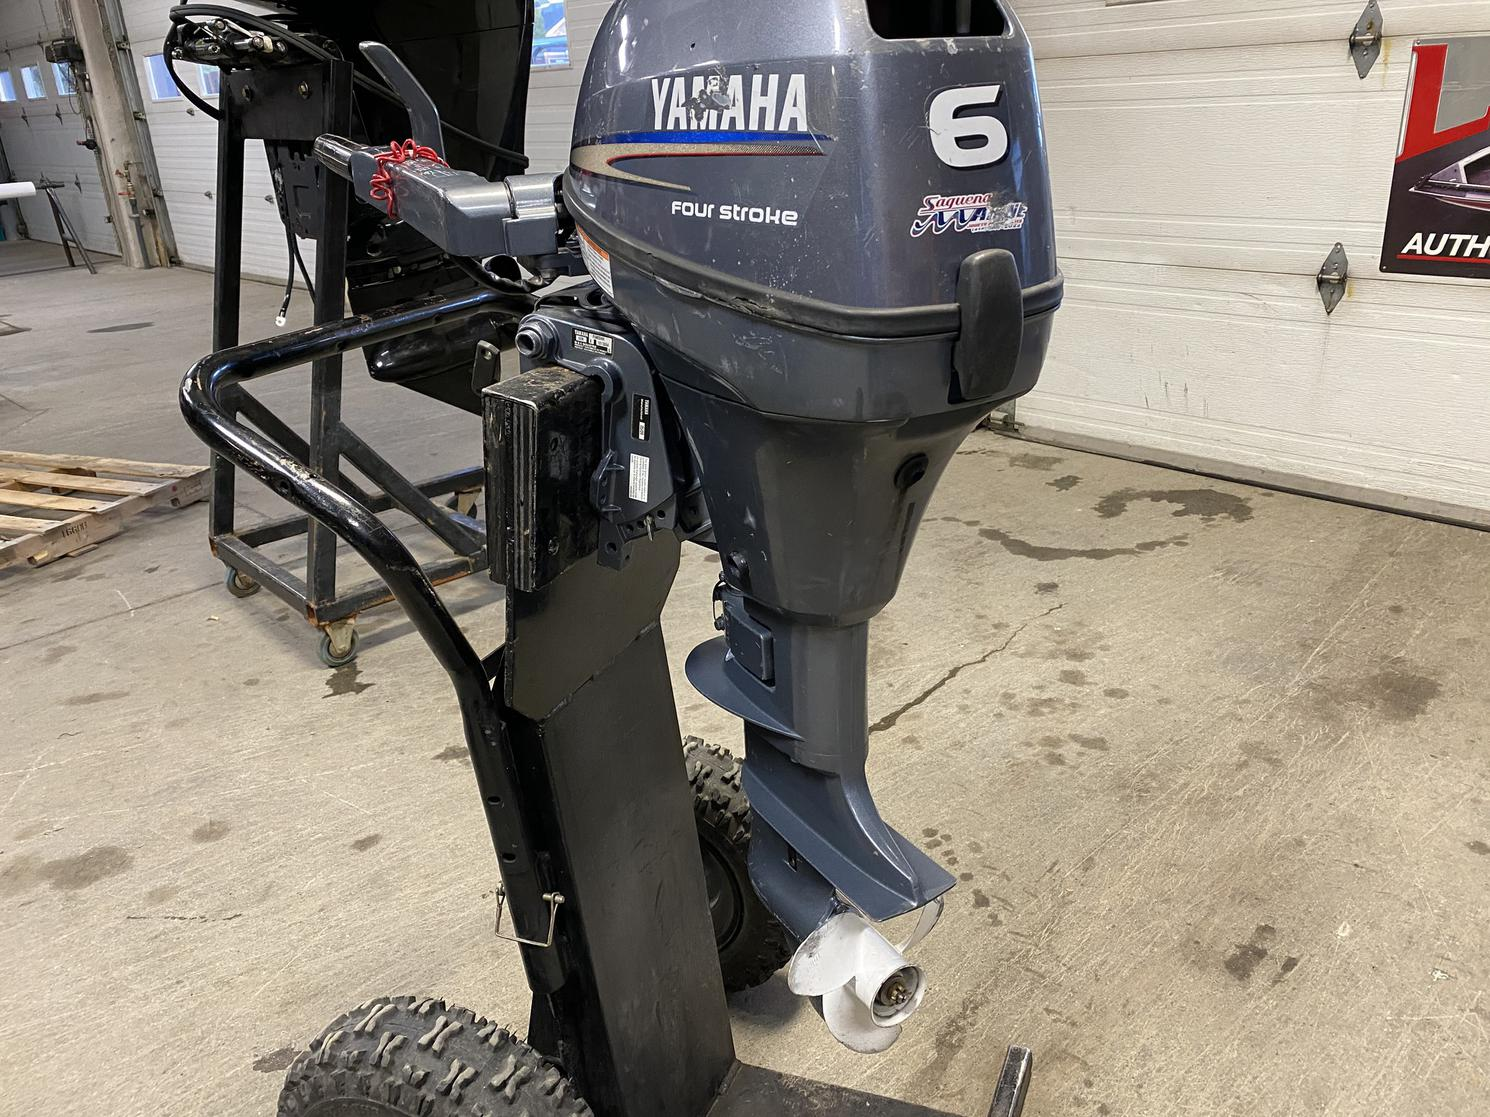 2009 Yamaha F6 mshh 6 hp